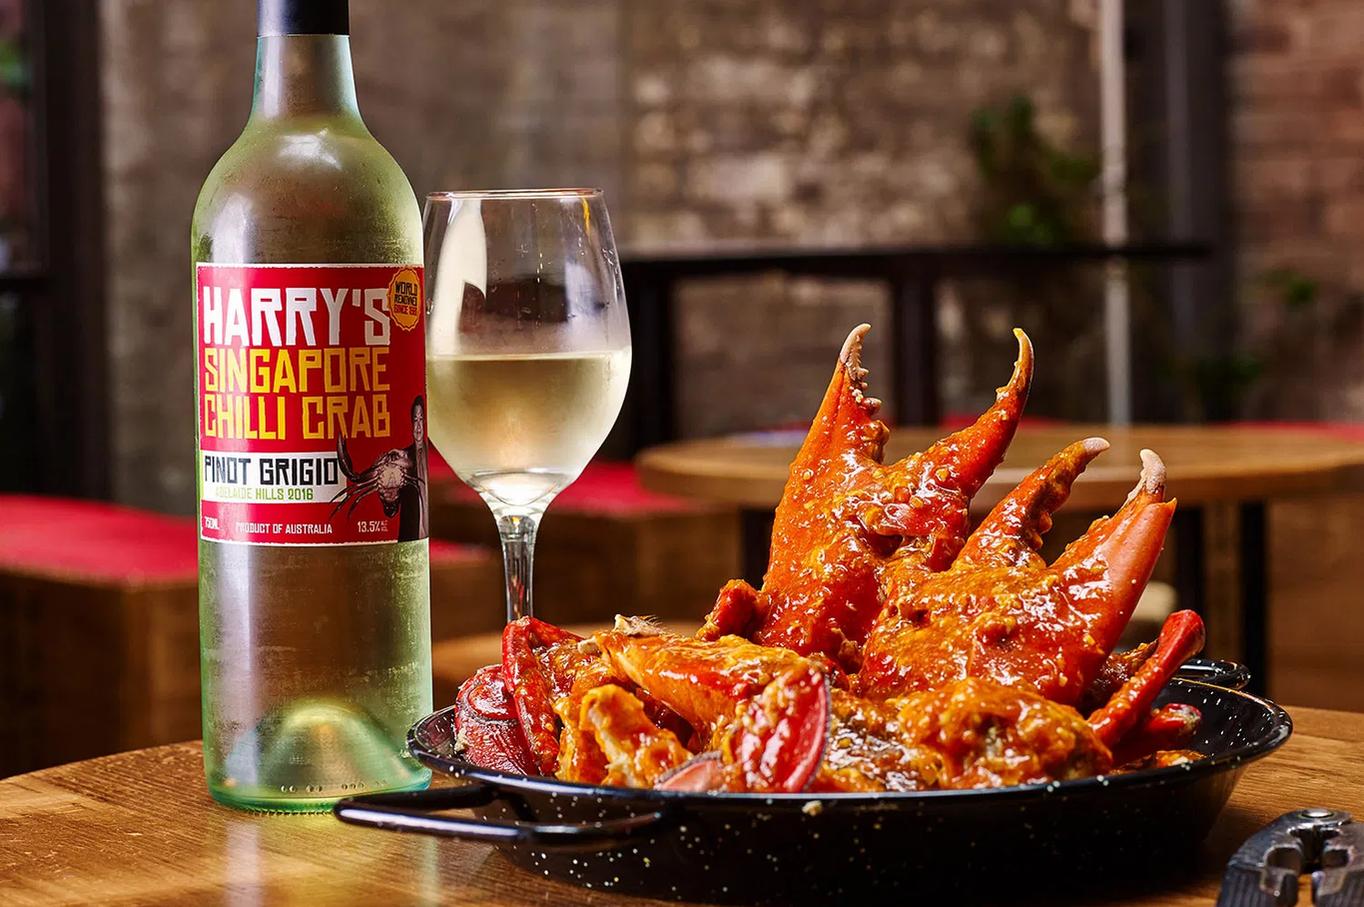 harrys-chilli-crab-main.webp